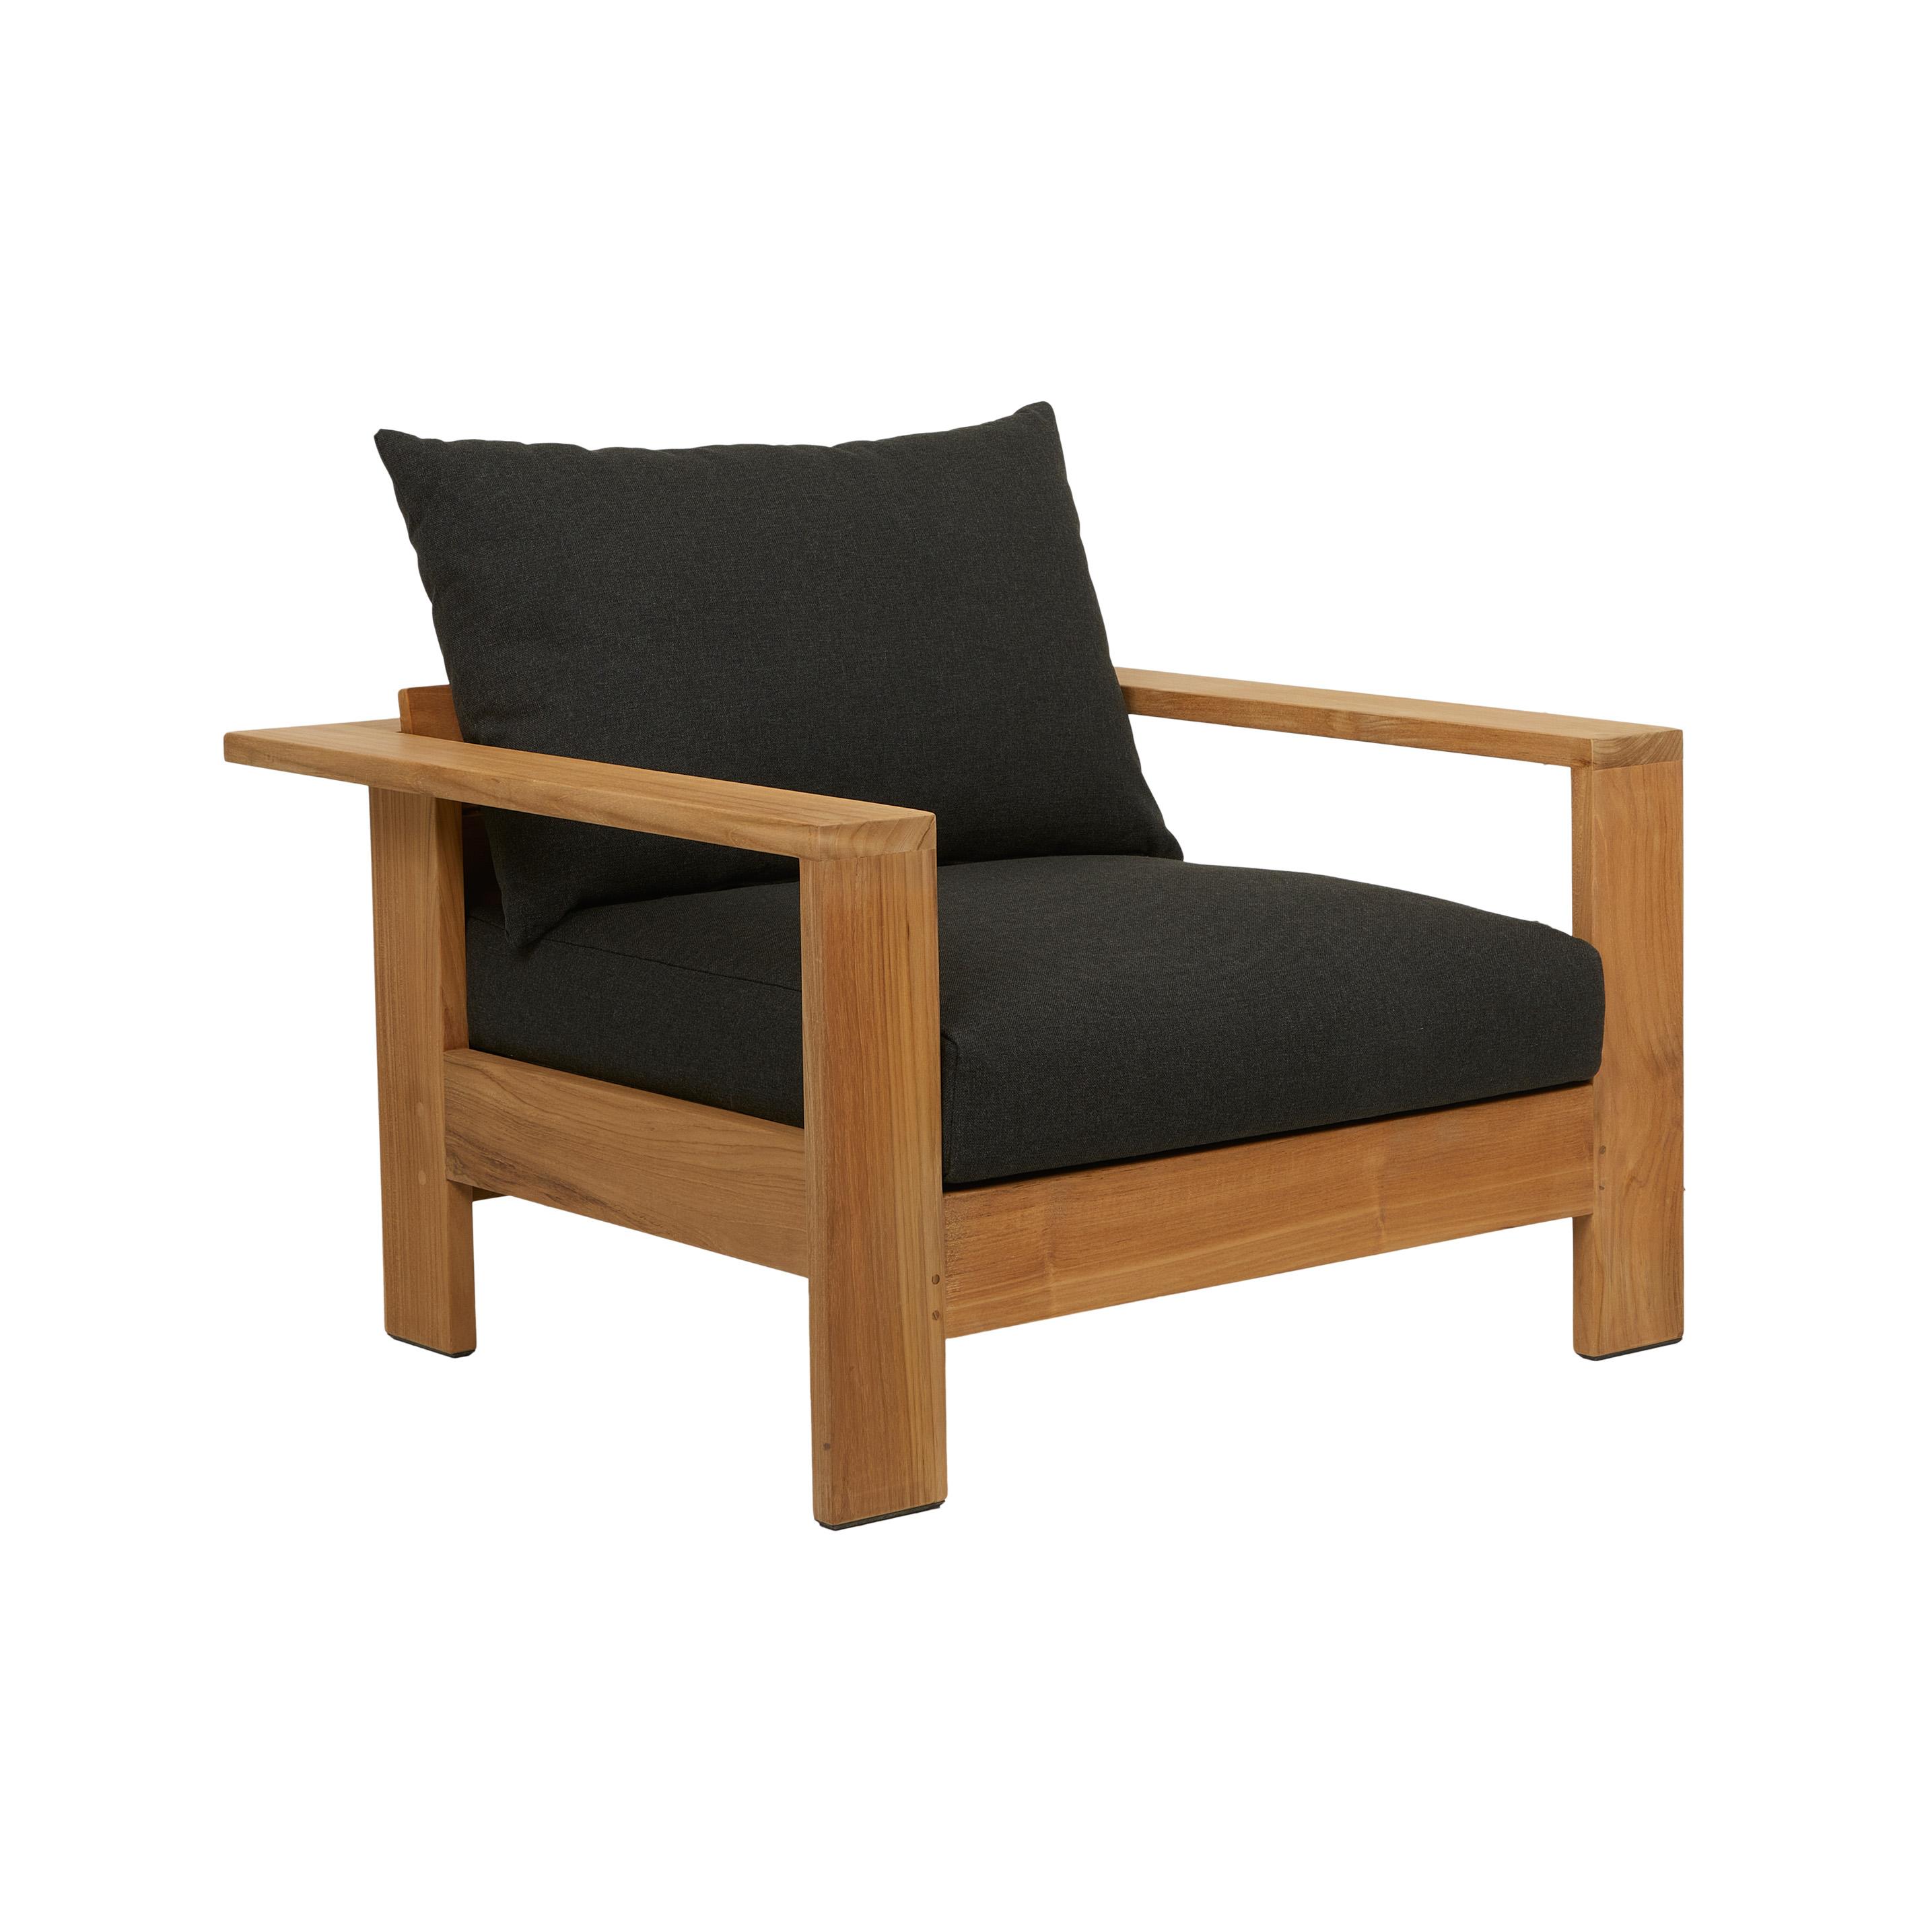 Furniture Hero-Images Sofas hamptons-one-seater-02